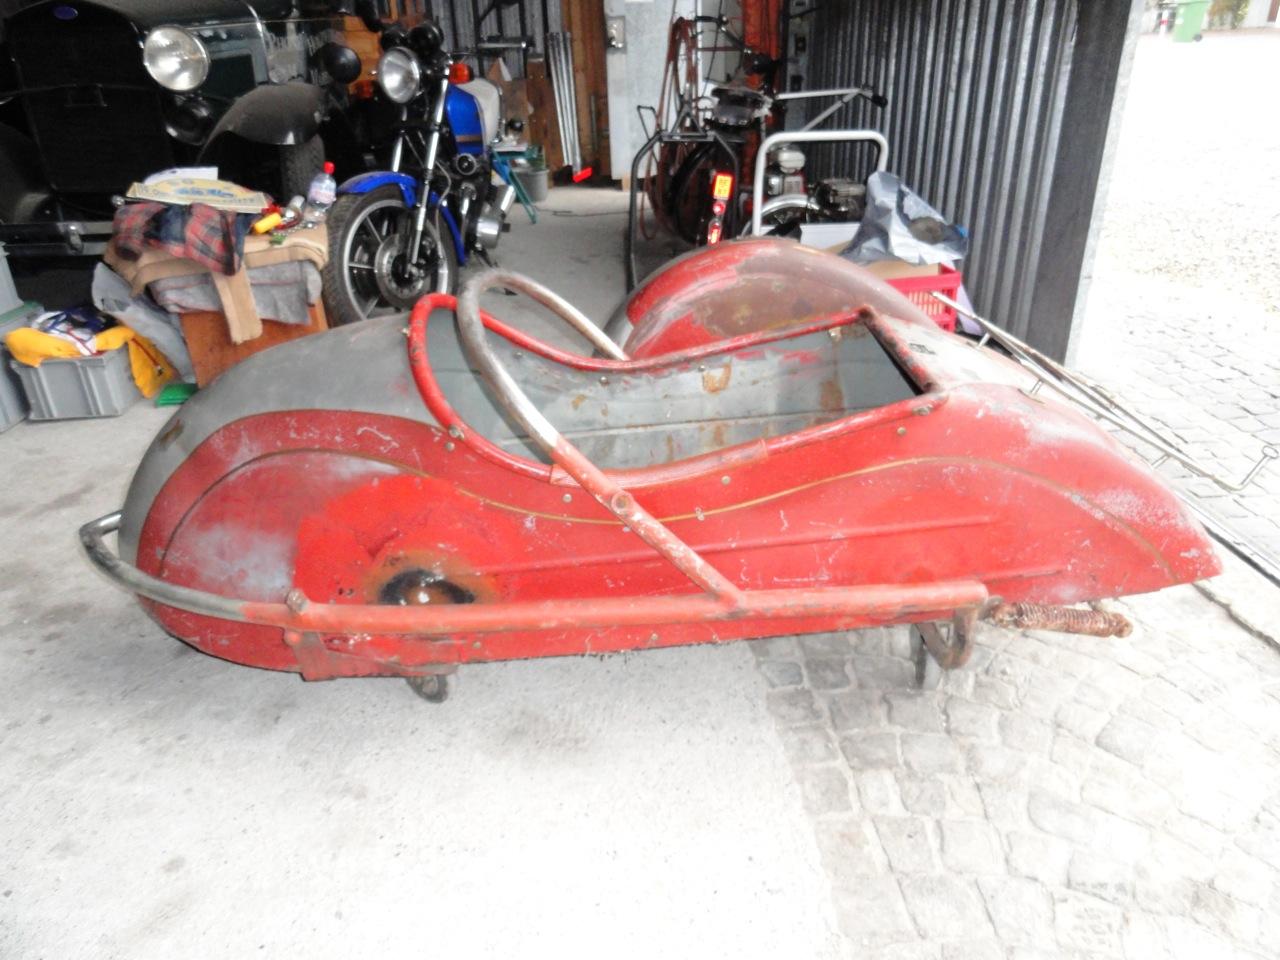 2 Motosacoche sidecar